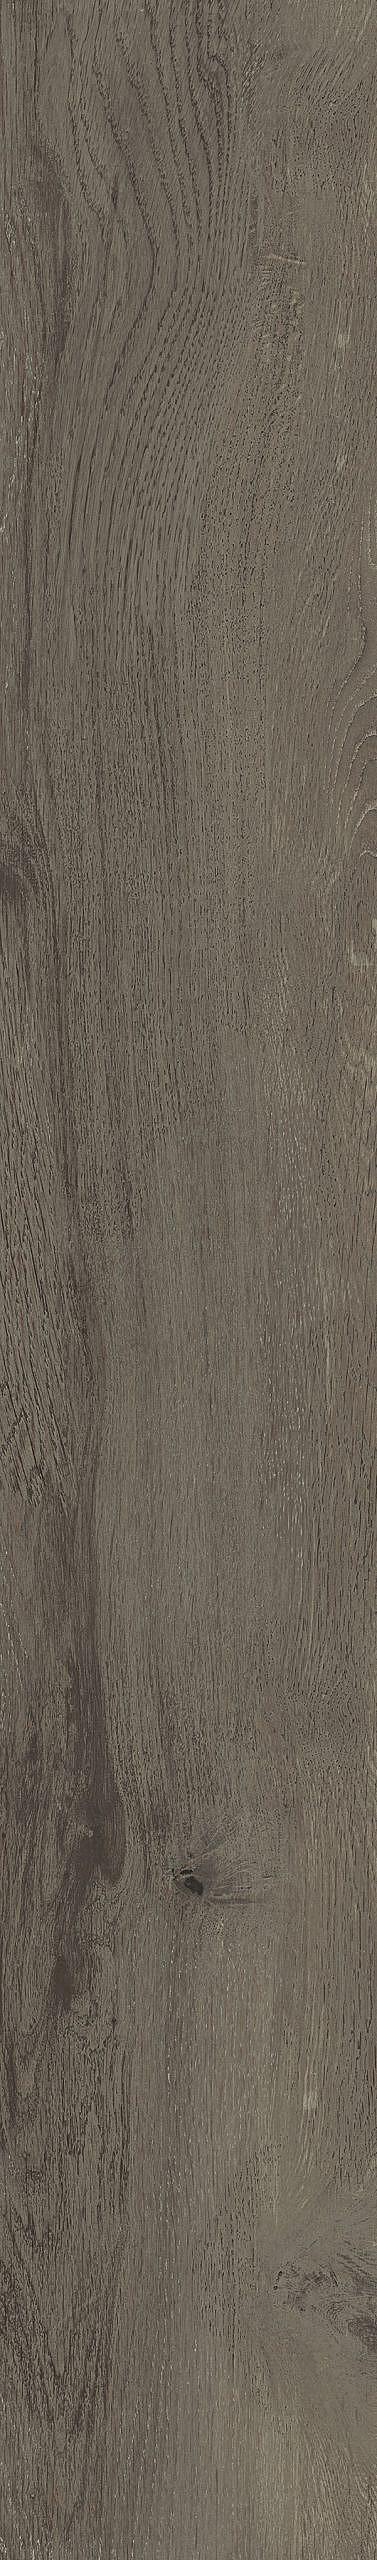 Naples-bruin-26,5x180